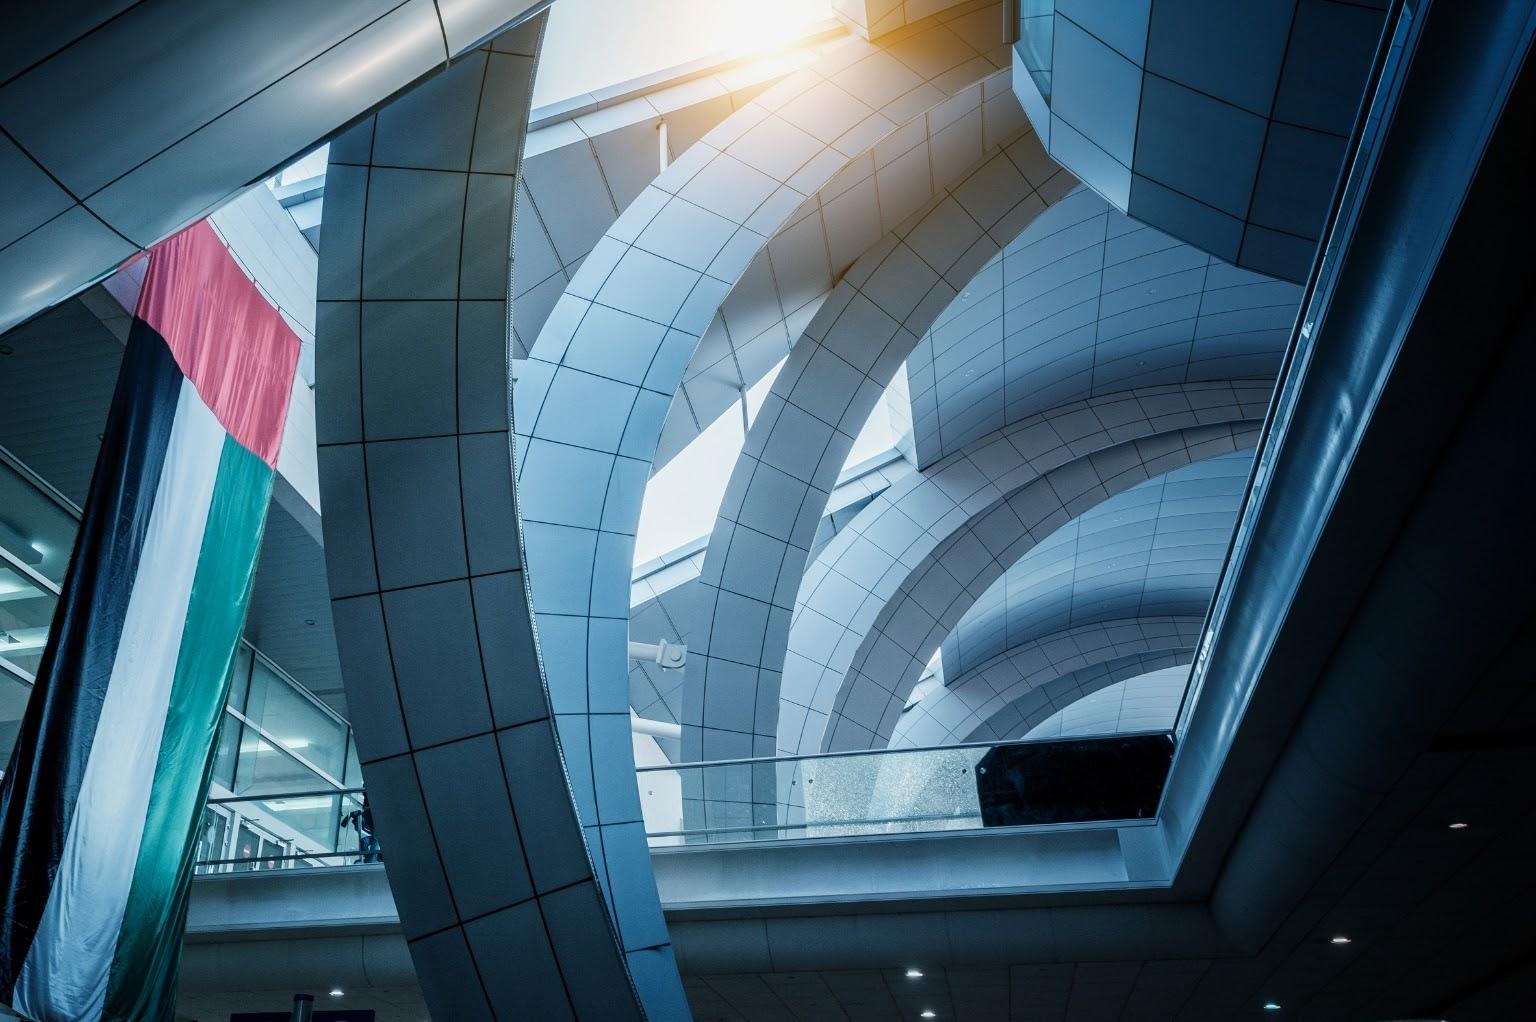 Interior of Dubai International Airport